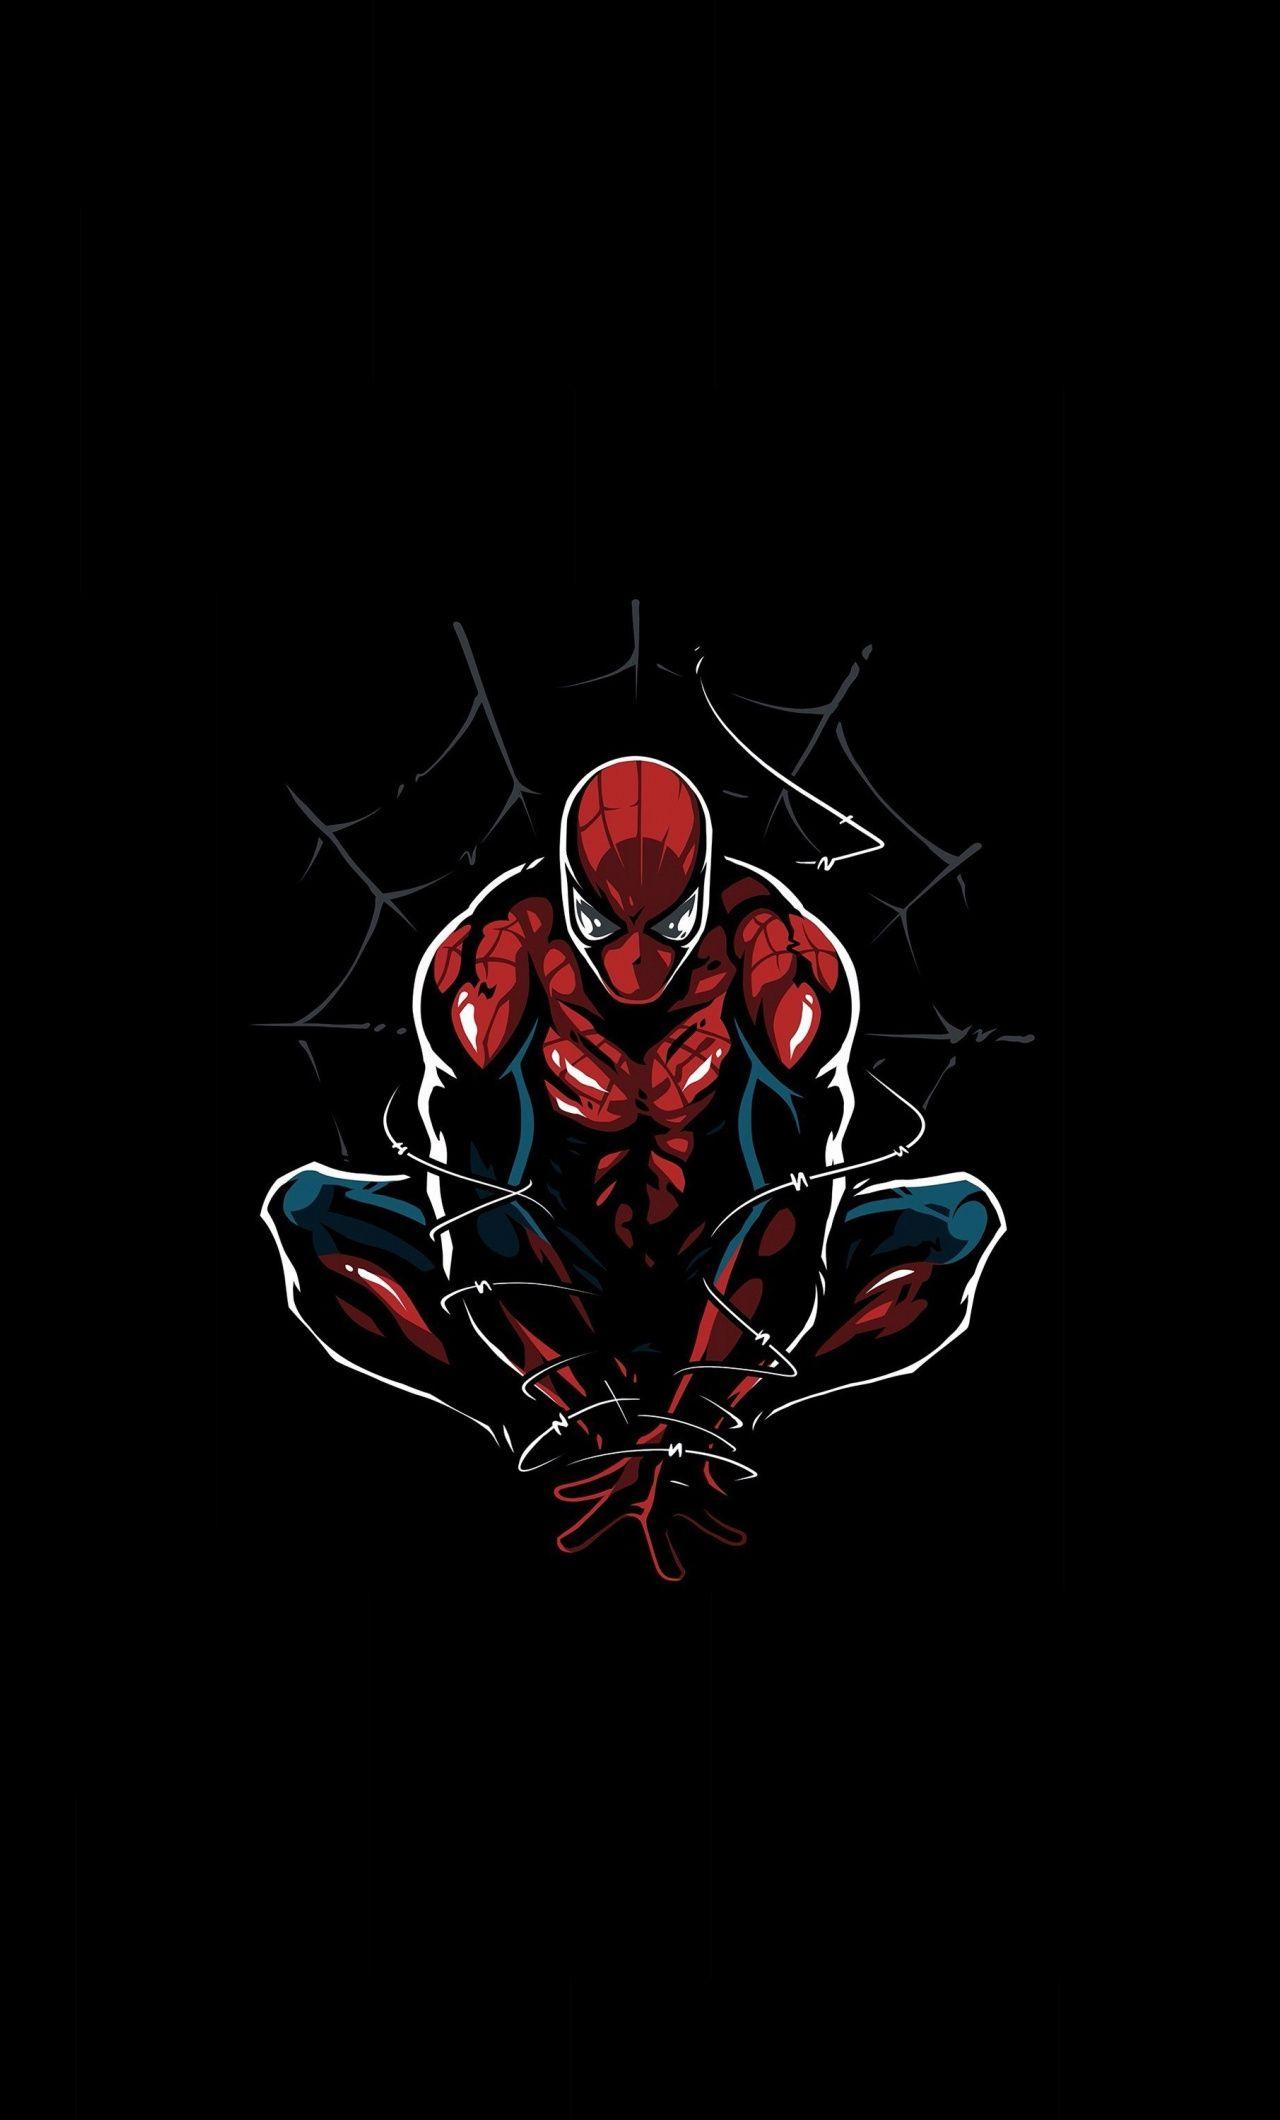 Dark Spider Man Minimal Artwork 1280x2120 Wallpaper Avengers Wallpaper Marvel Comics Wallpaper Spiderman Artwork